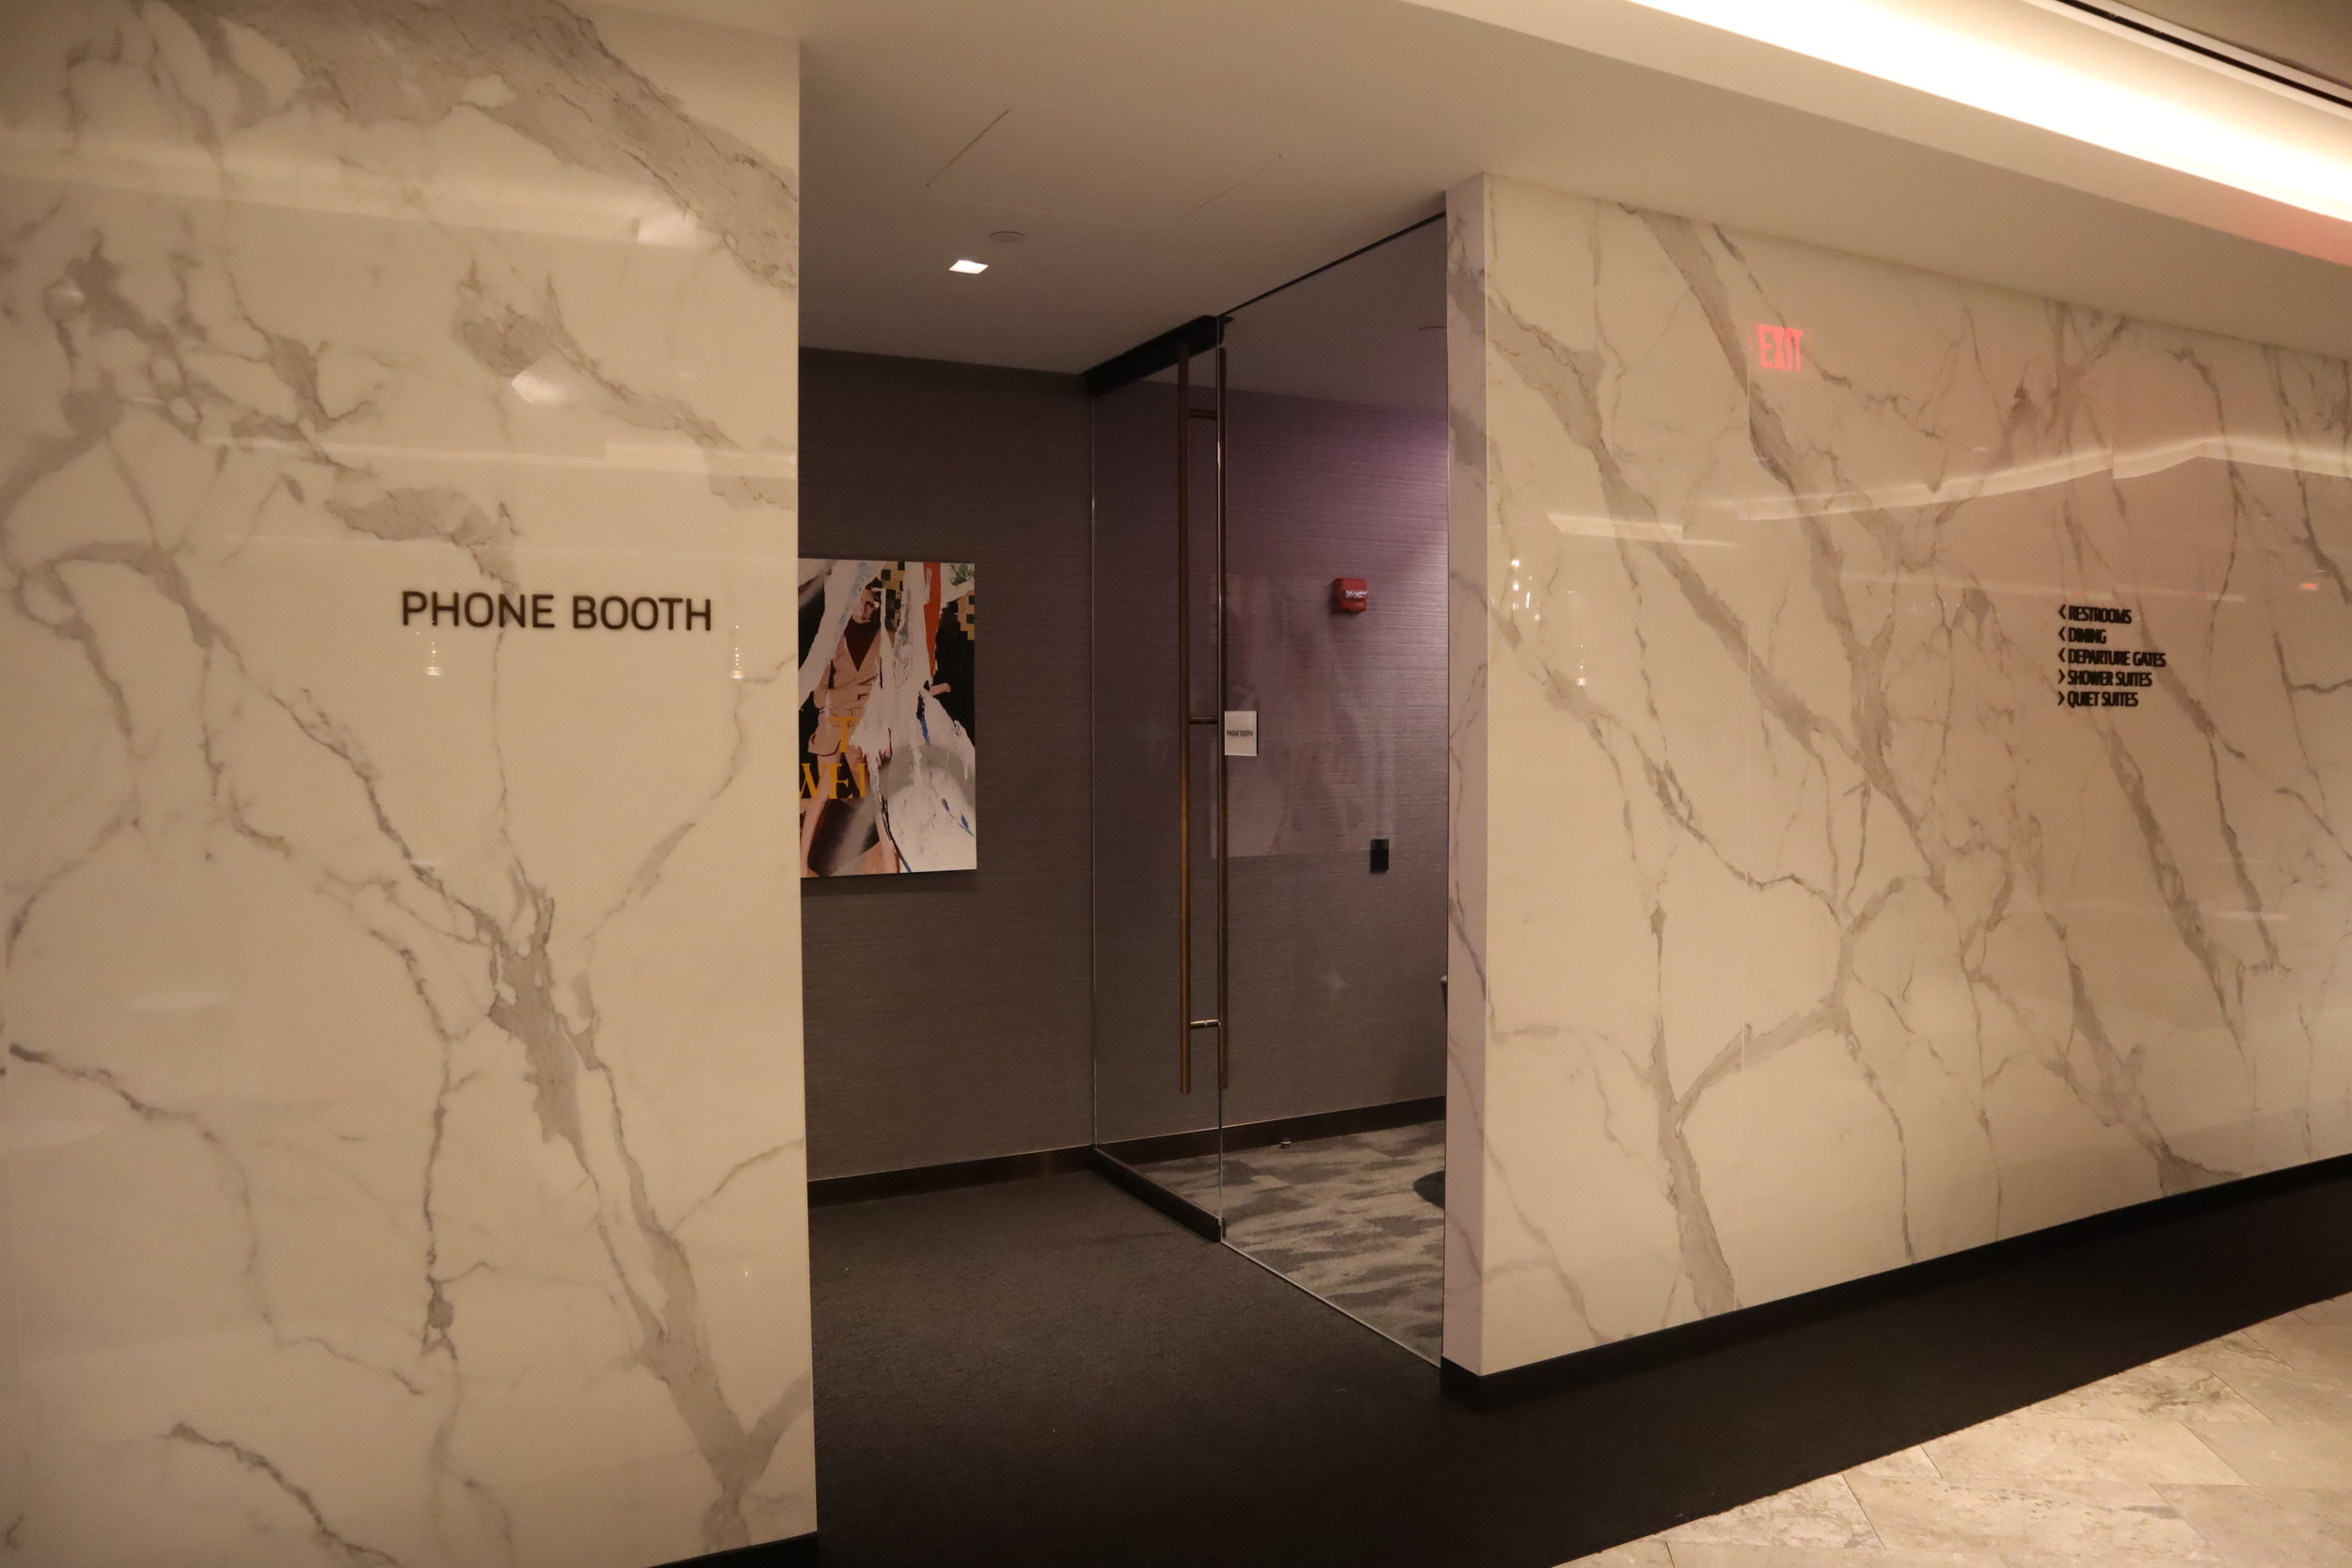 United Polaris Lounge Newark – Phone booths